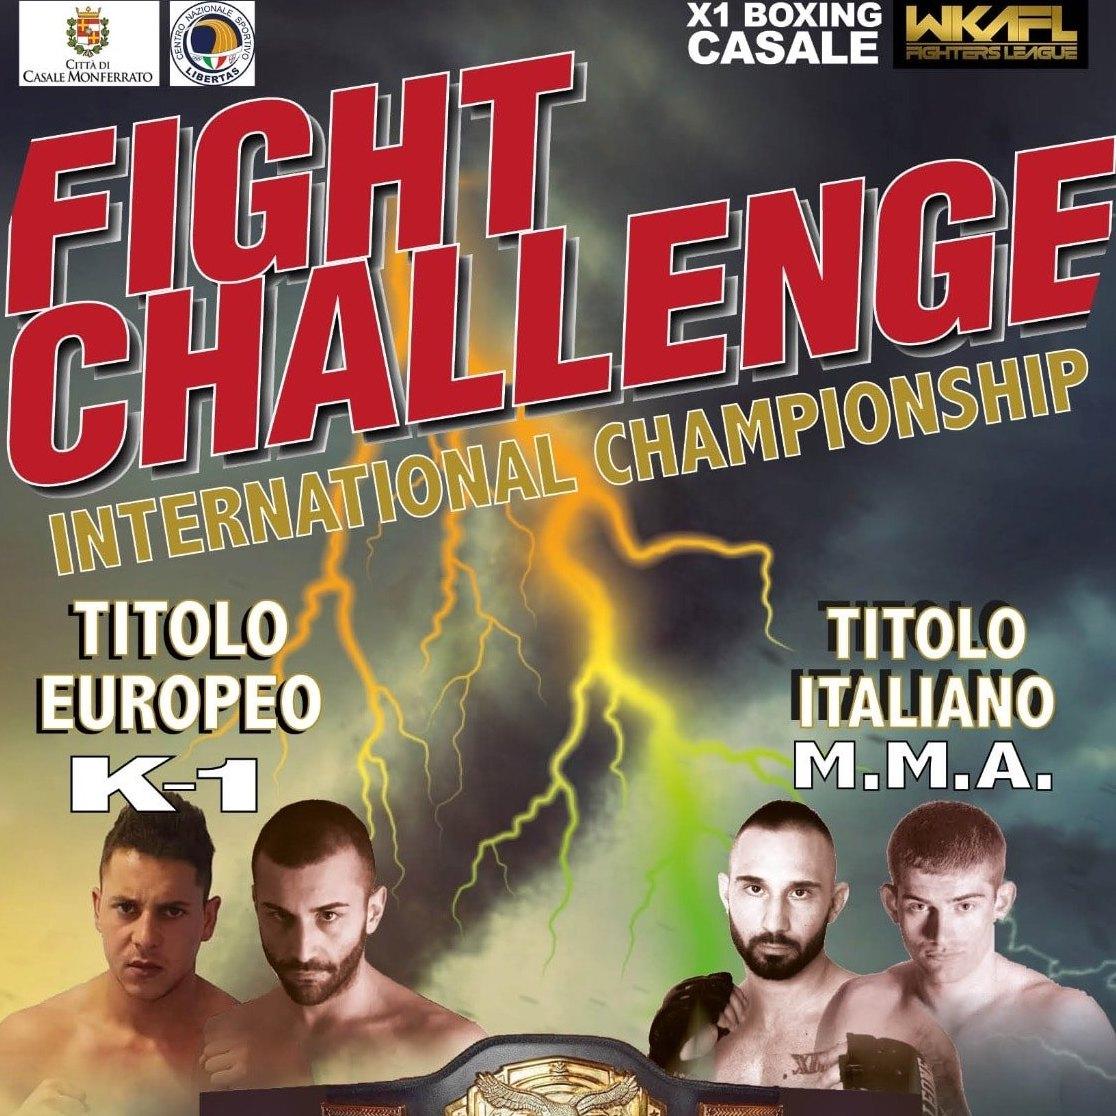 Fight Challenge International Championship